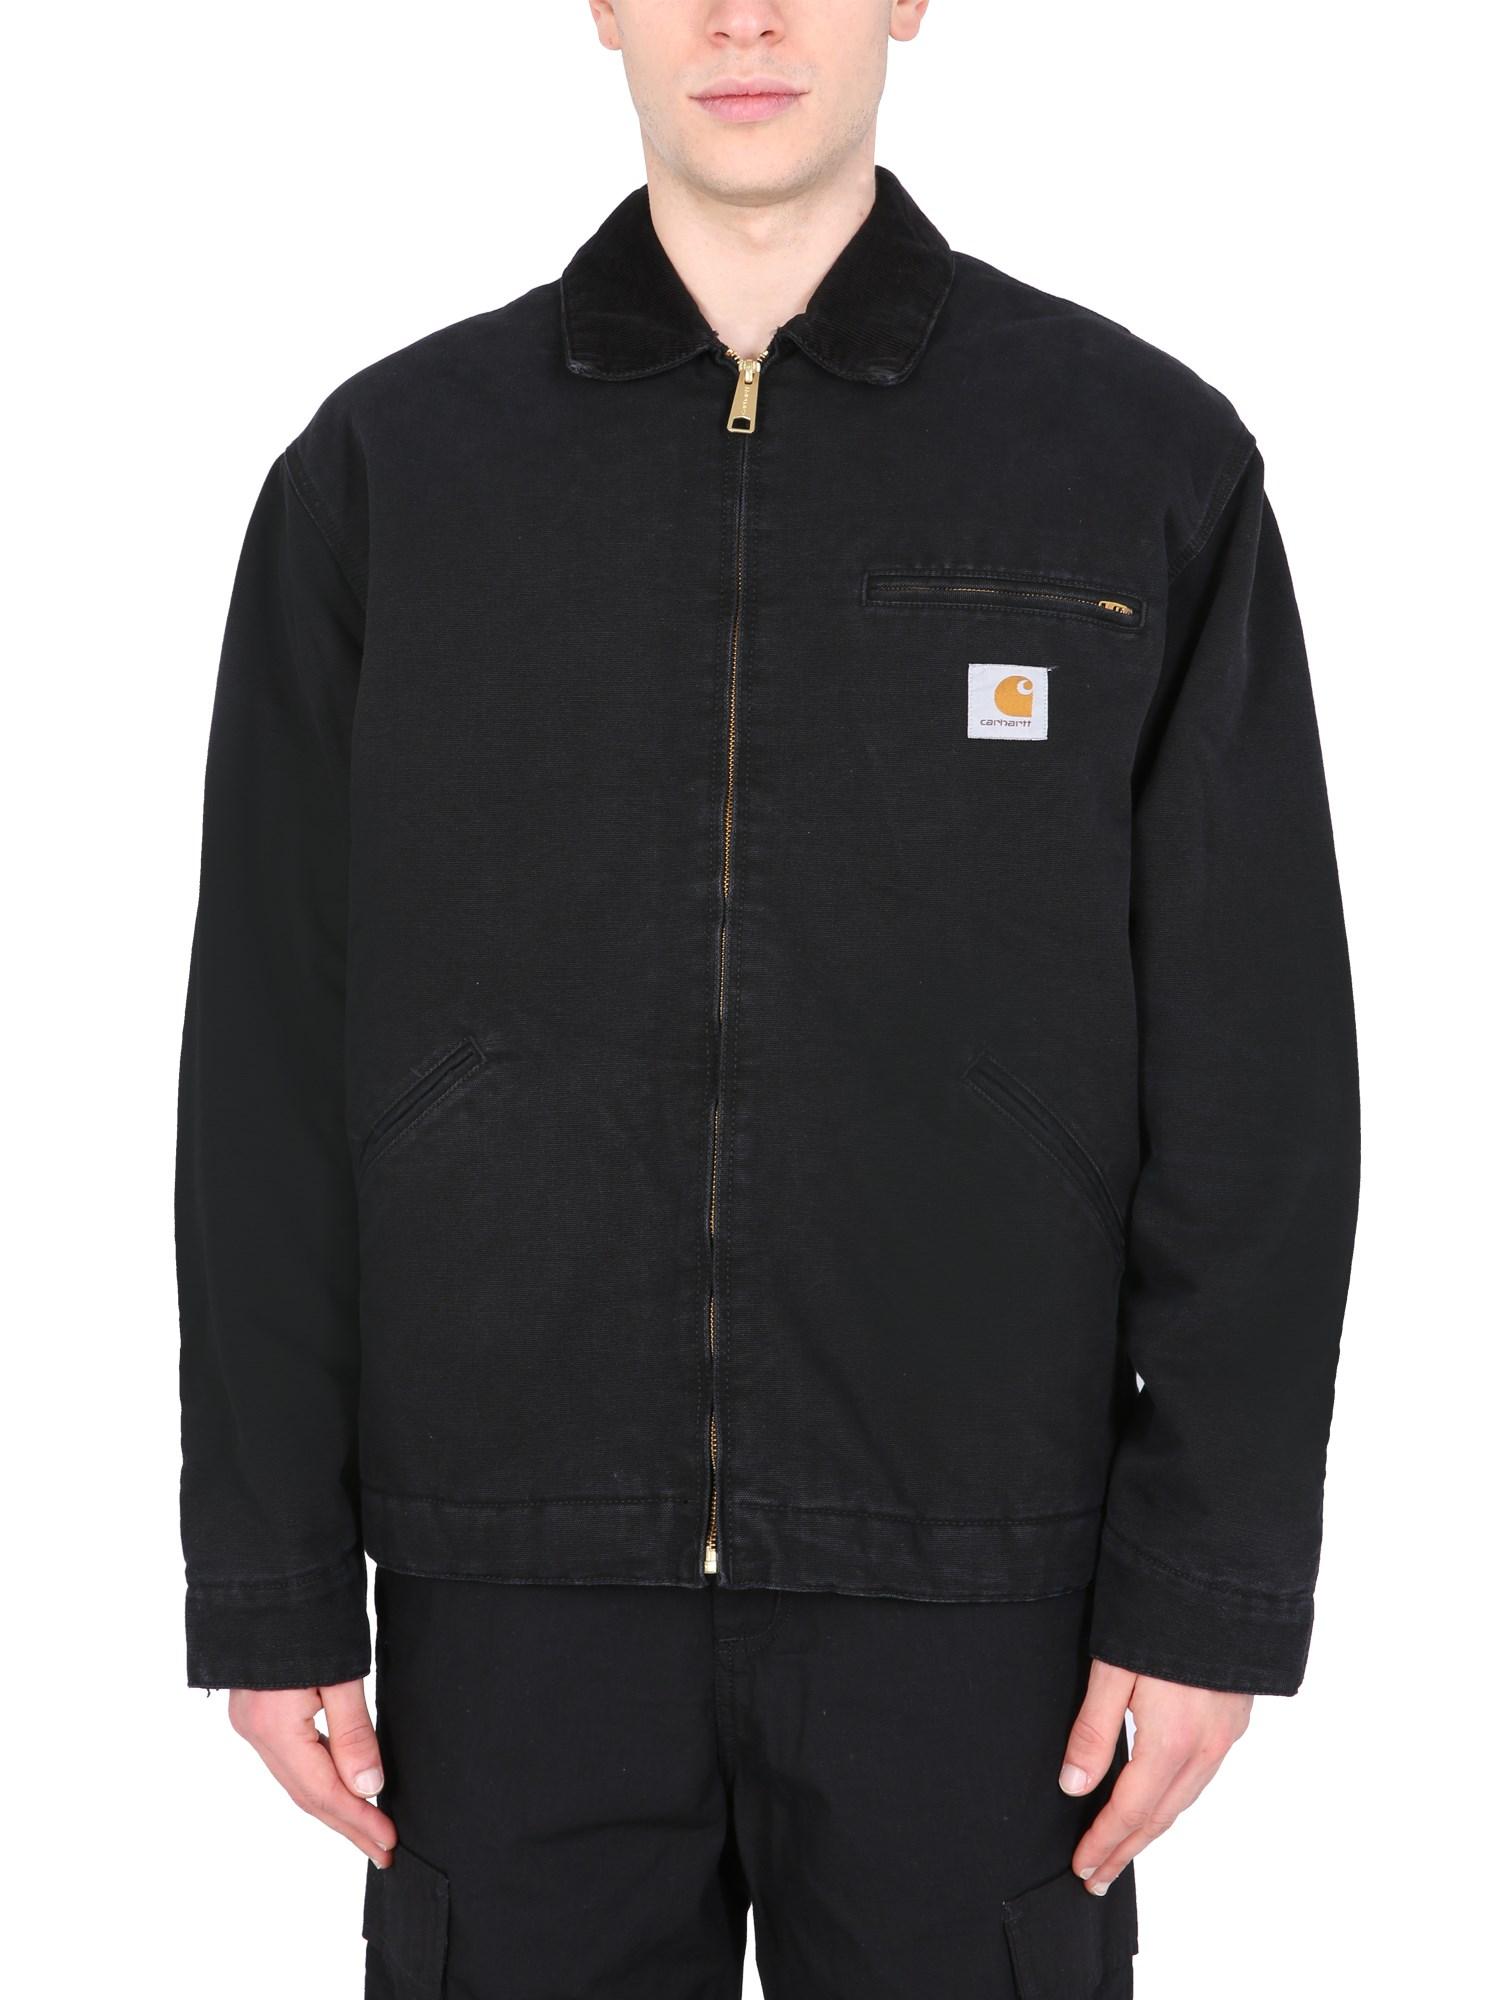 "Carhartt wip ""detroit"" jacket - carhartt wip - Modalova"